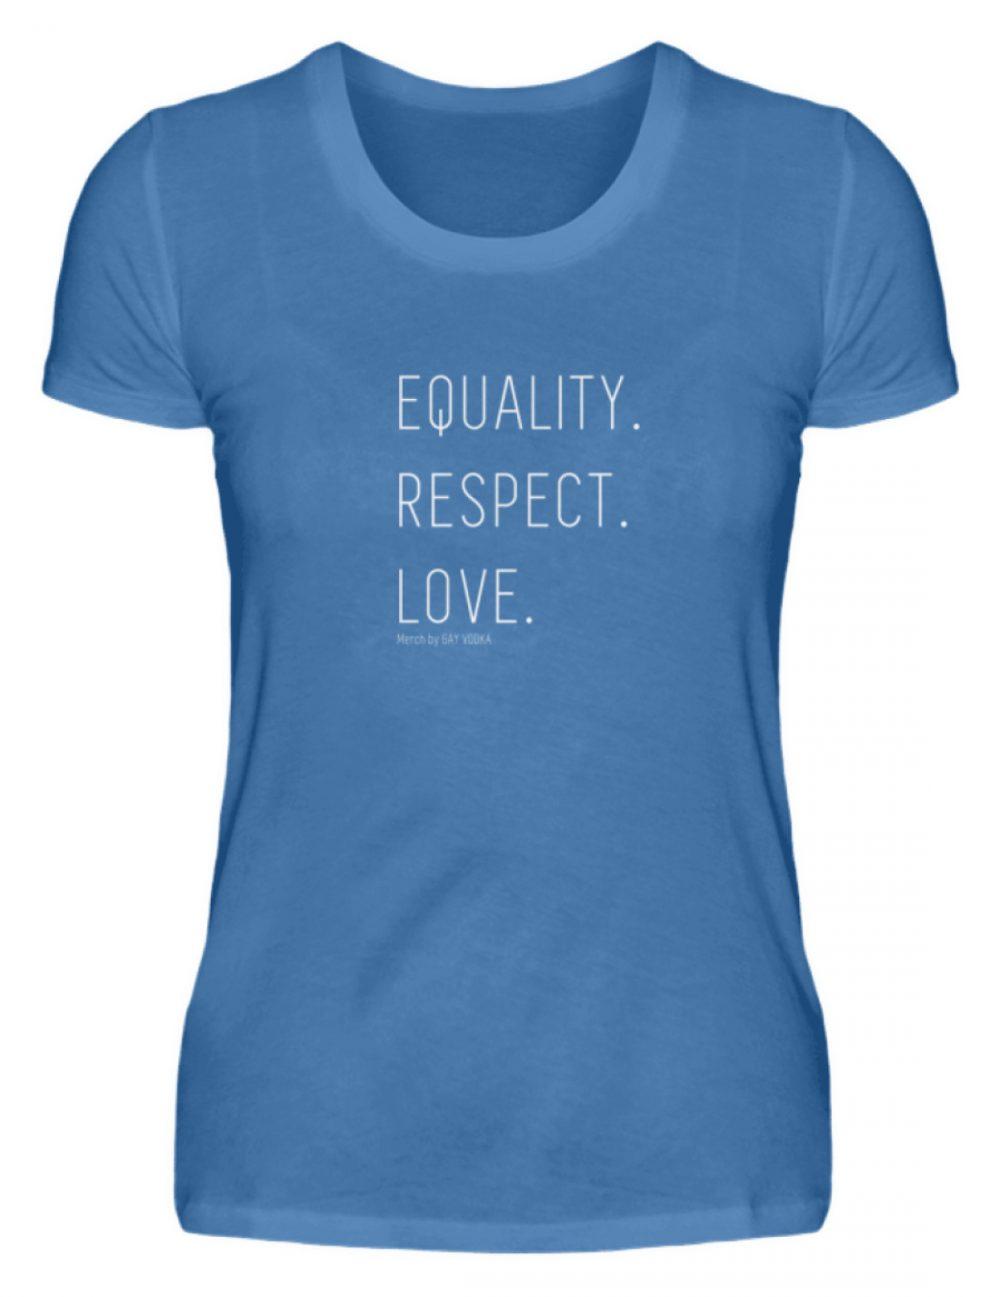 EQUALITY. RESPECT. LOVE. - Damen Premiumshirt-2894